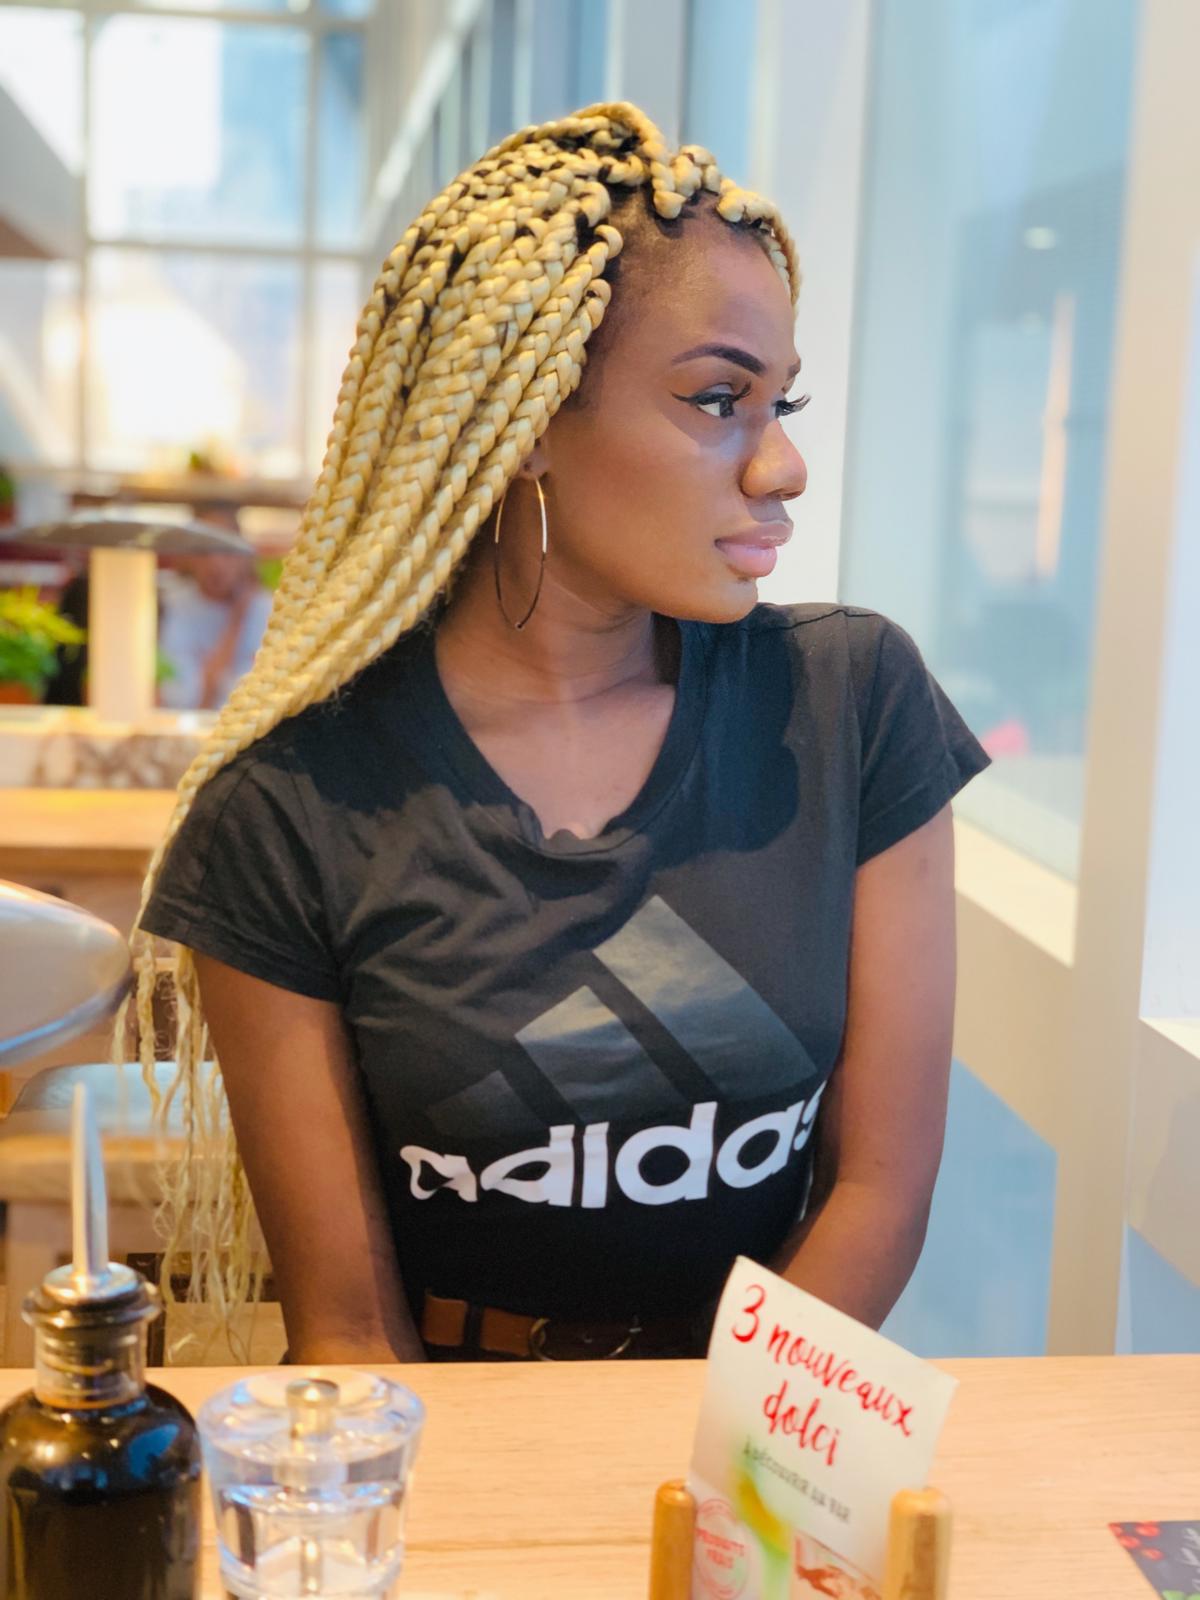 salon de coiffure afro tresse tresses box braids crochet braids vanilles tissages paris 75 77 78 91 92 93 94 95 BSIJAAOF